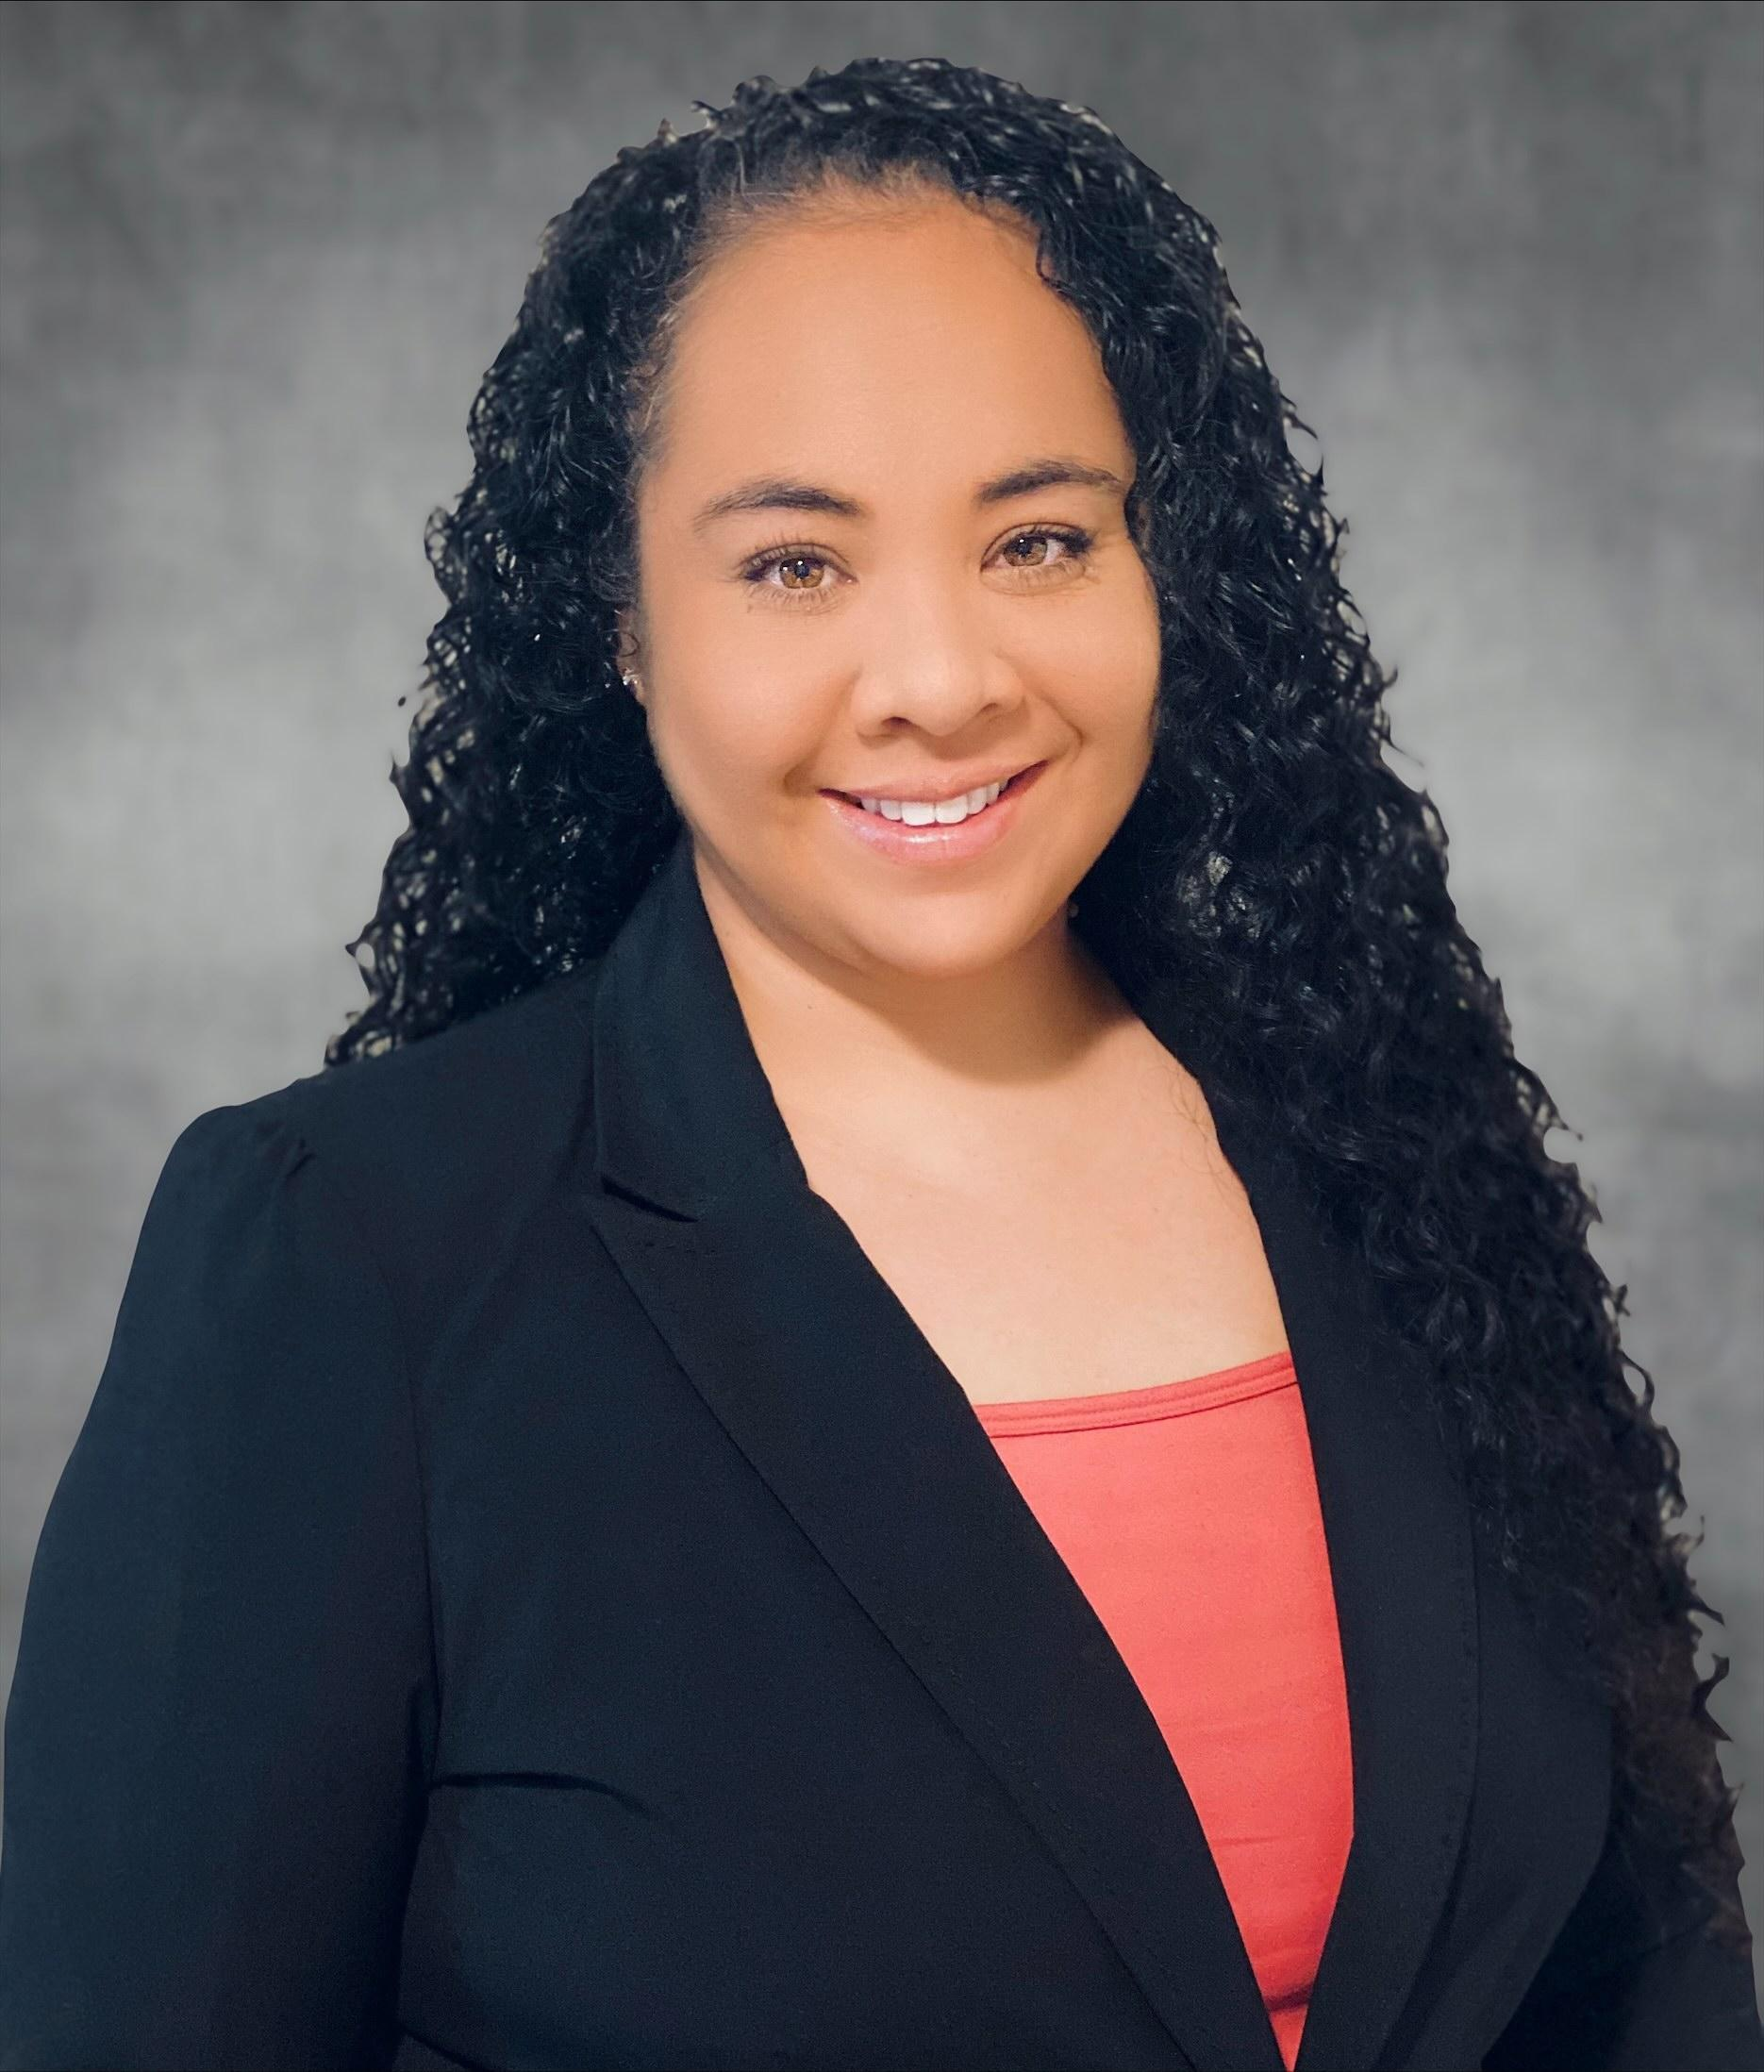 Mrs. Loriann A. Leota, Principal